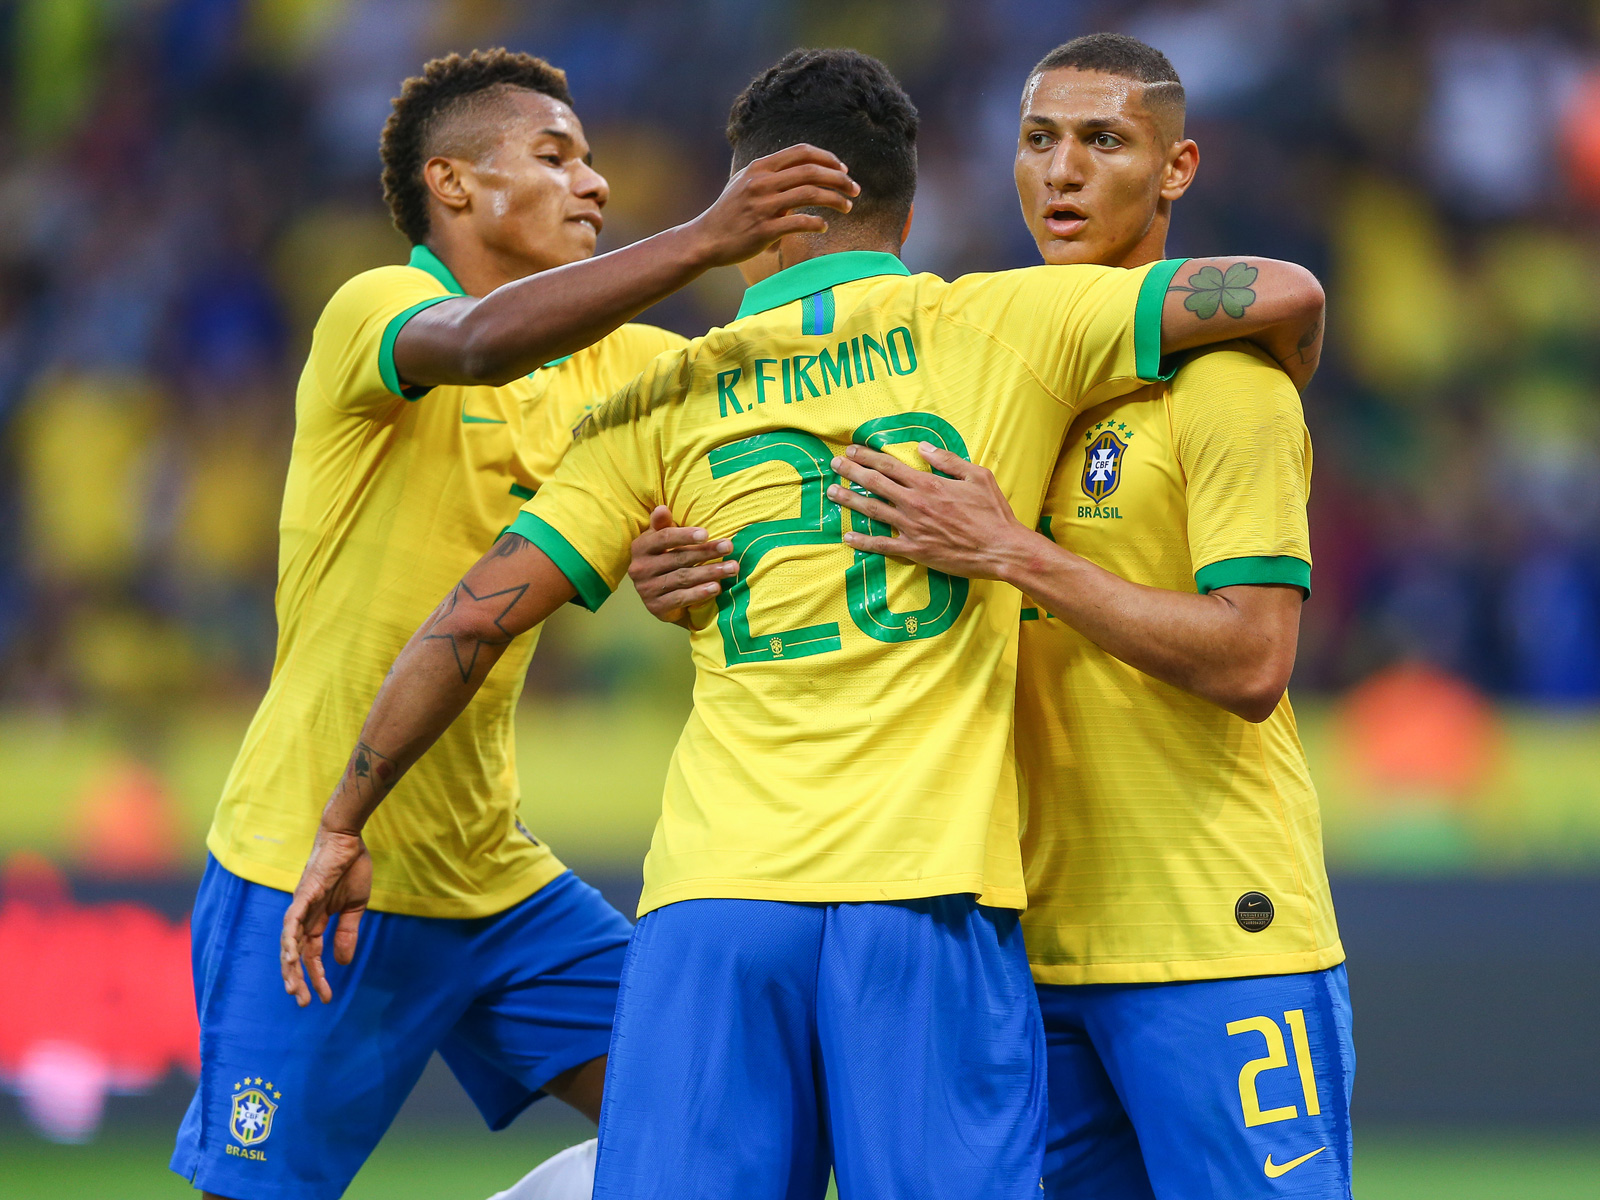 Brazil hopes to win Copa America on home soil